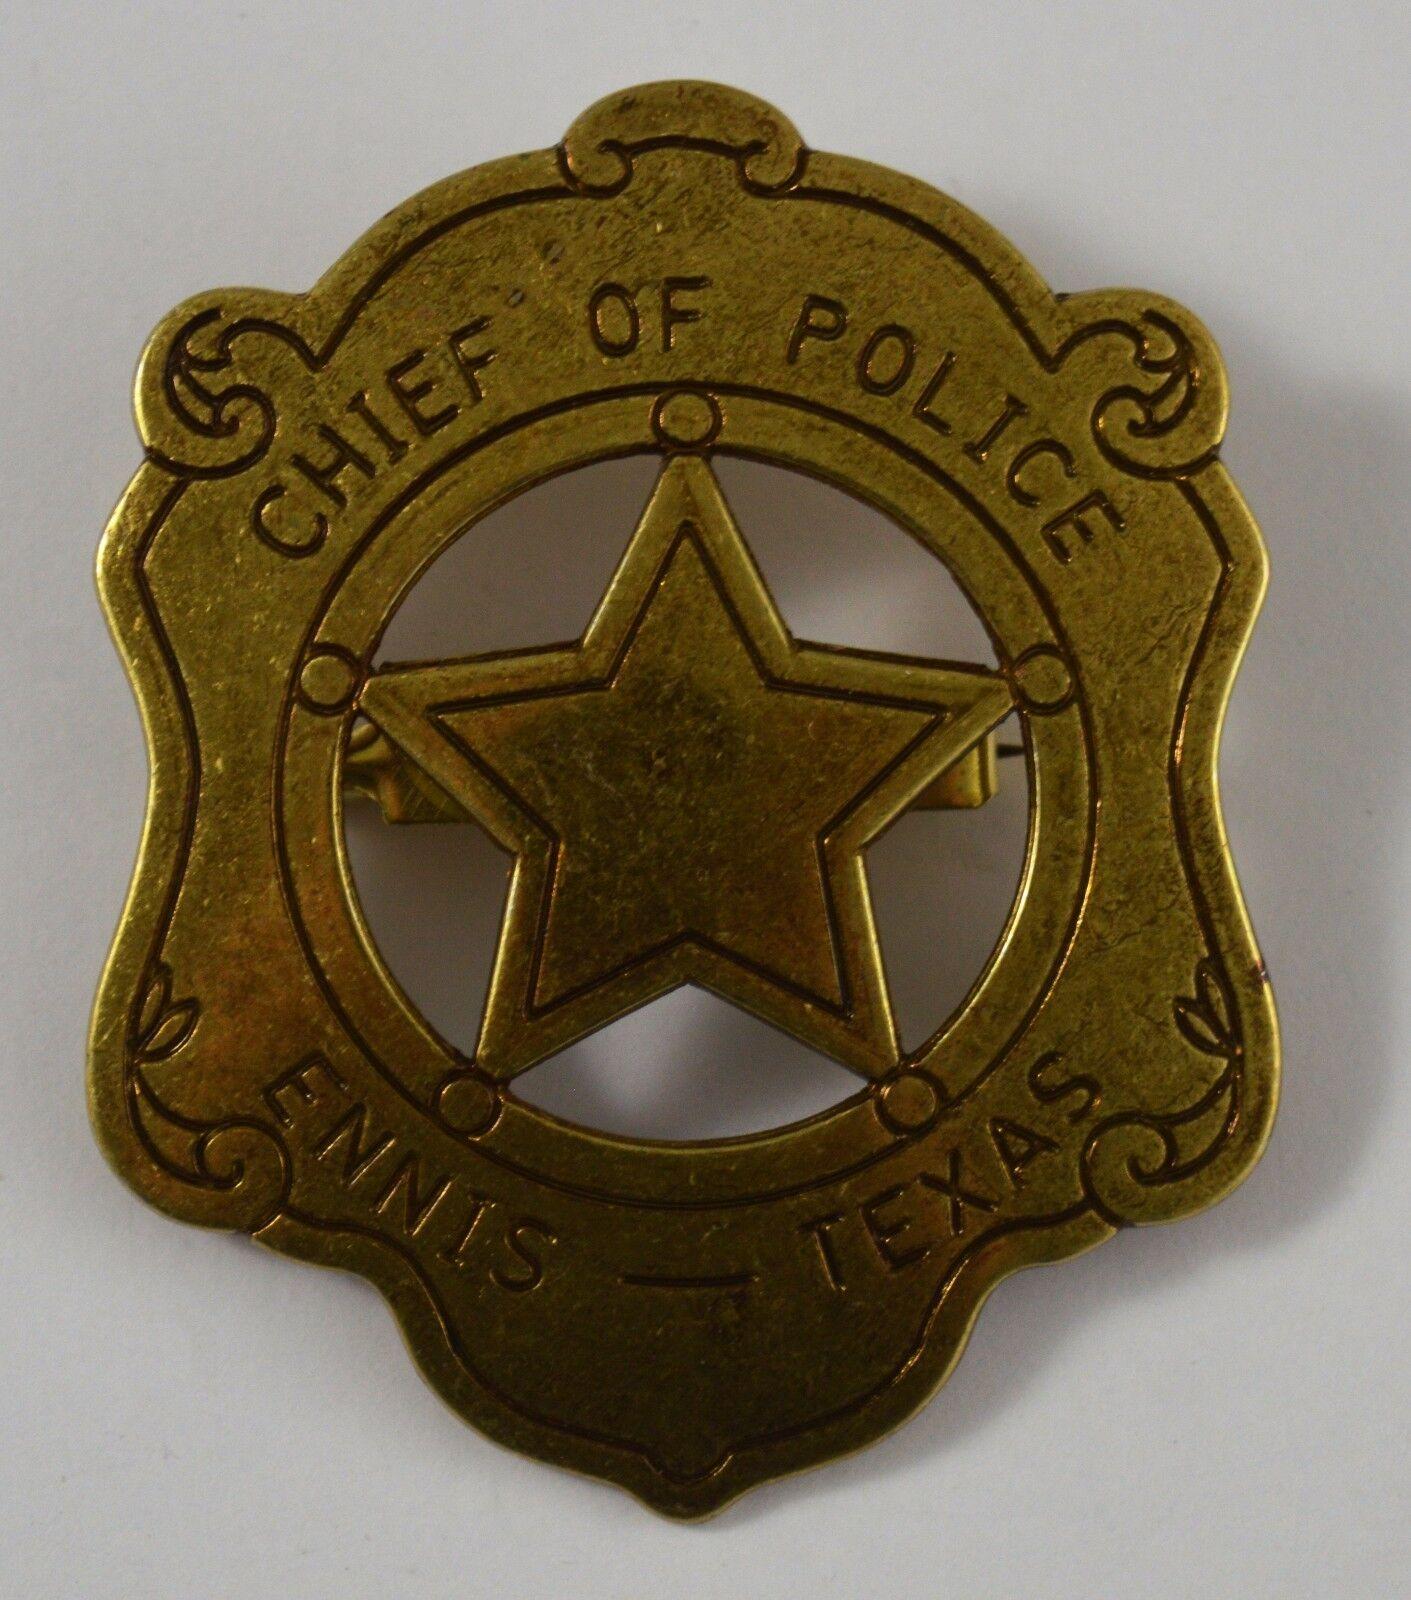 police historical memorabilia collectibles